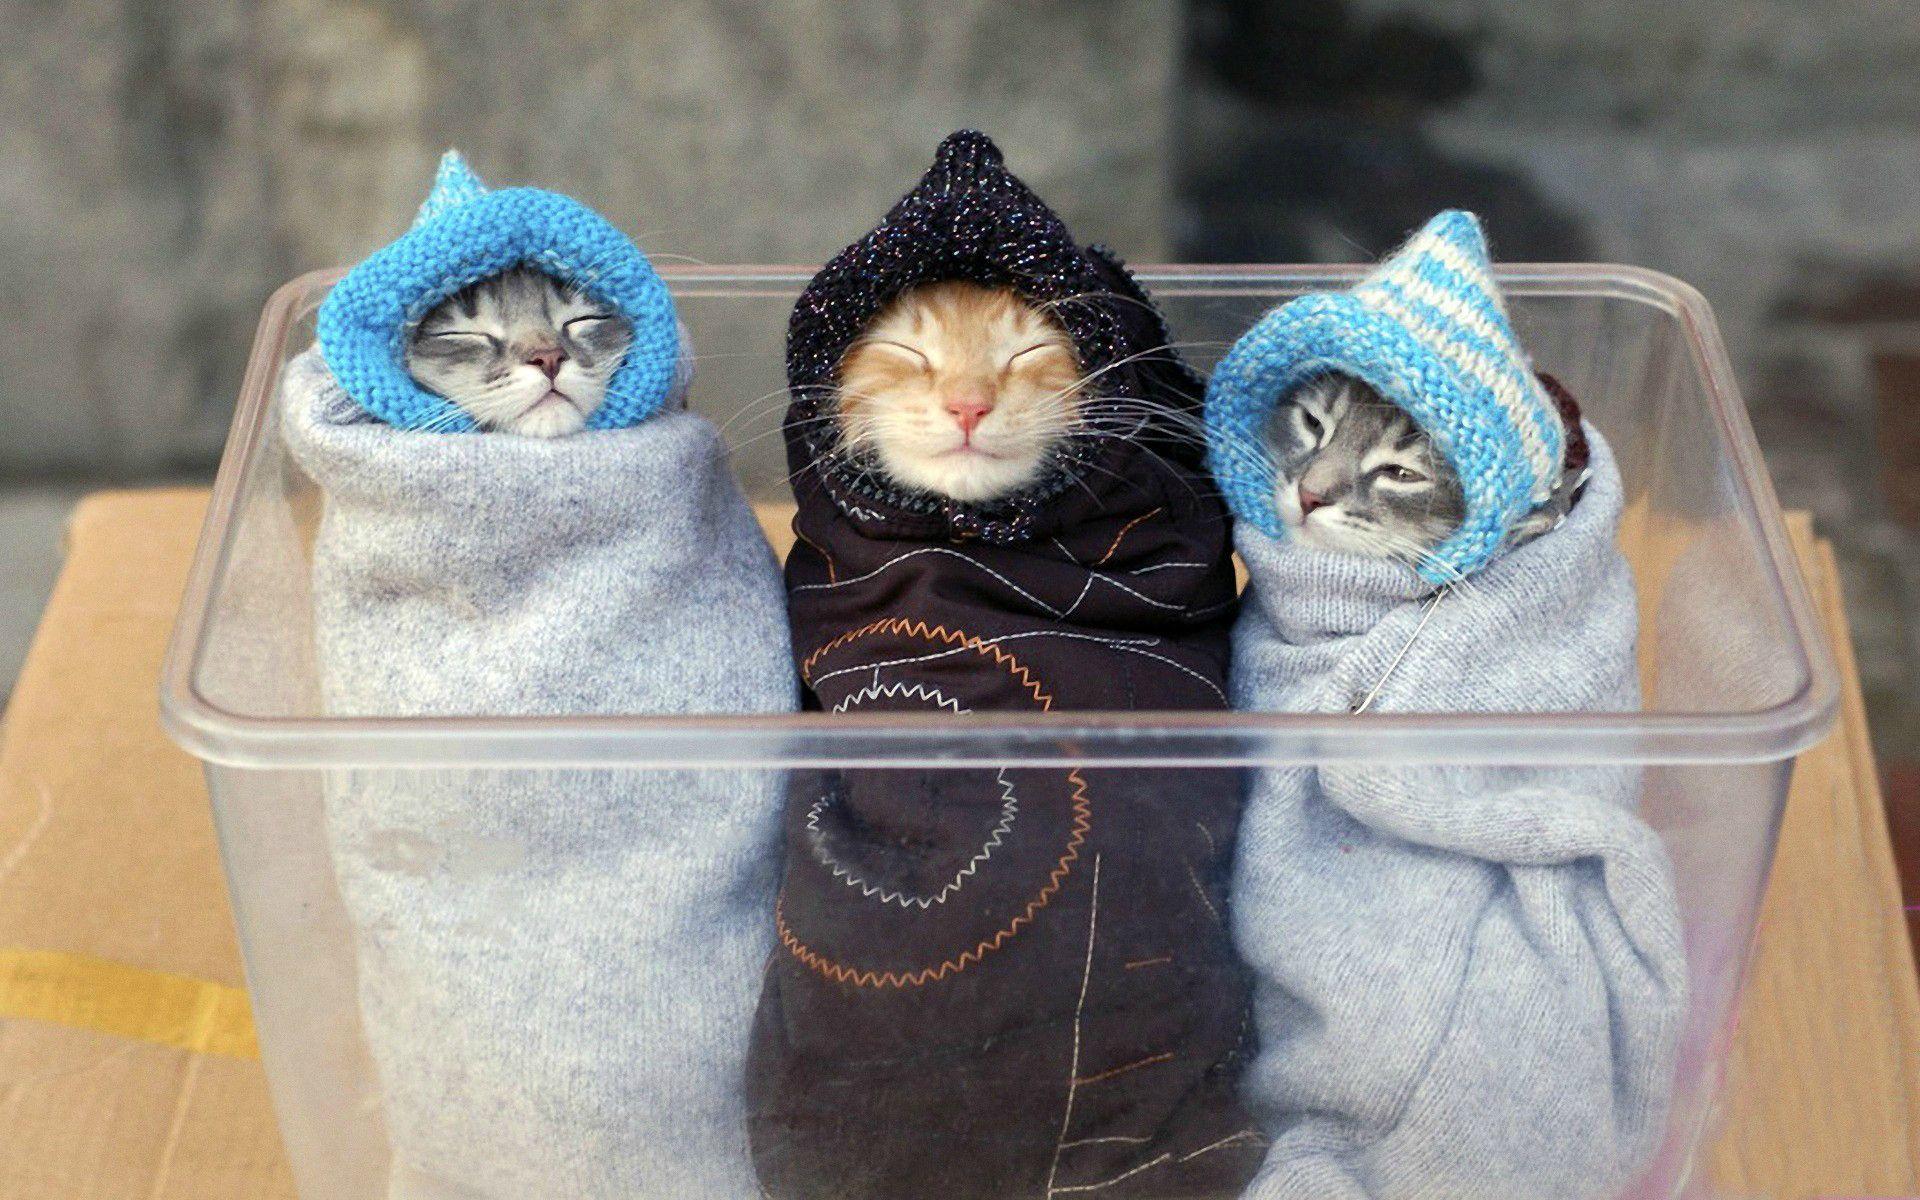 3 Winter Burritos Please! http://t.co/ZFhgu4ncSB